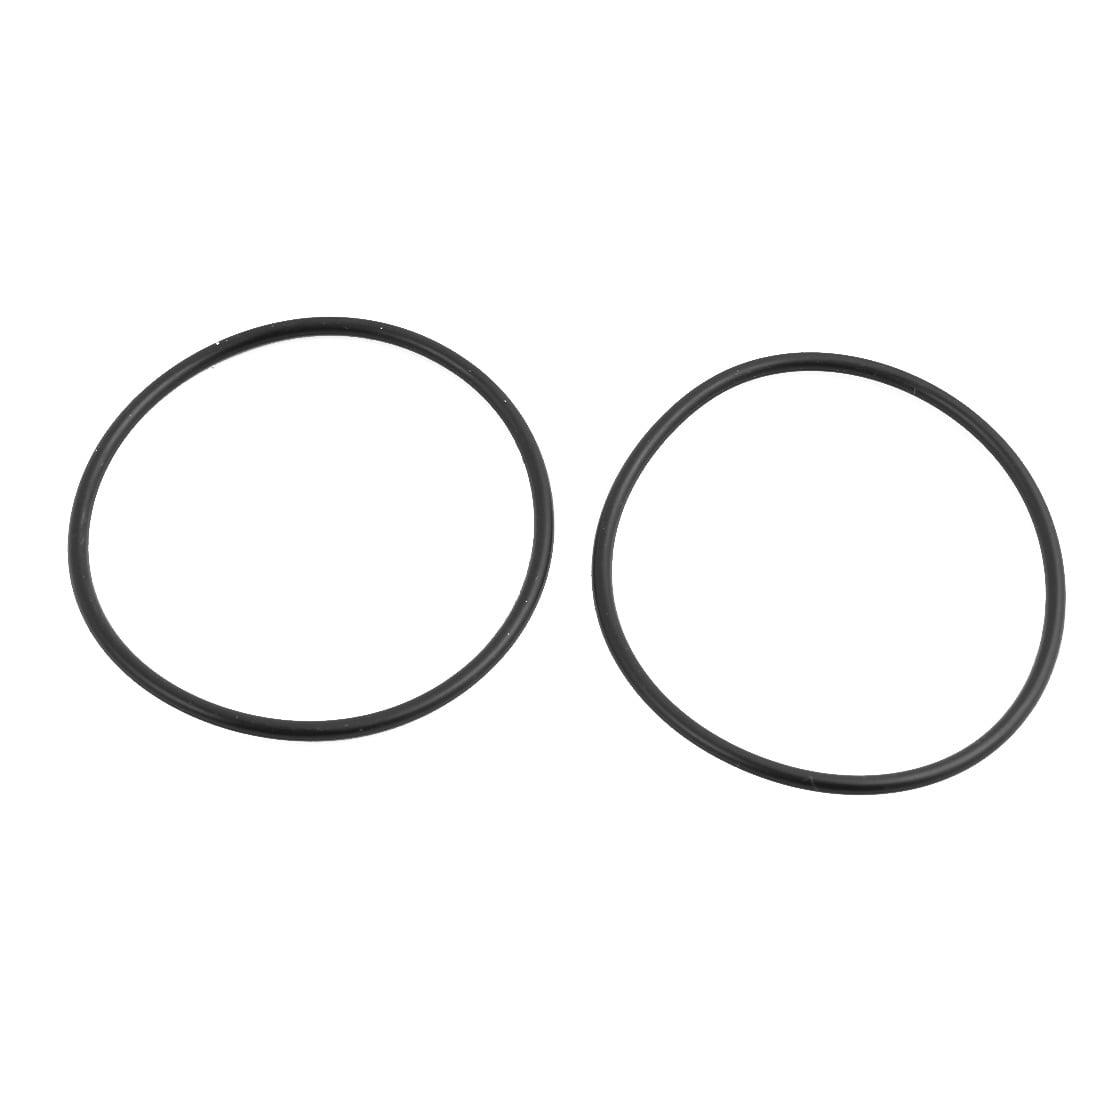 20Pcs Black Round Nitrile Butadiene Rubber NBR O-Ring 46mm OD 1.9mm Width - image 1 de 2